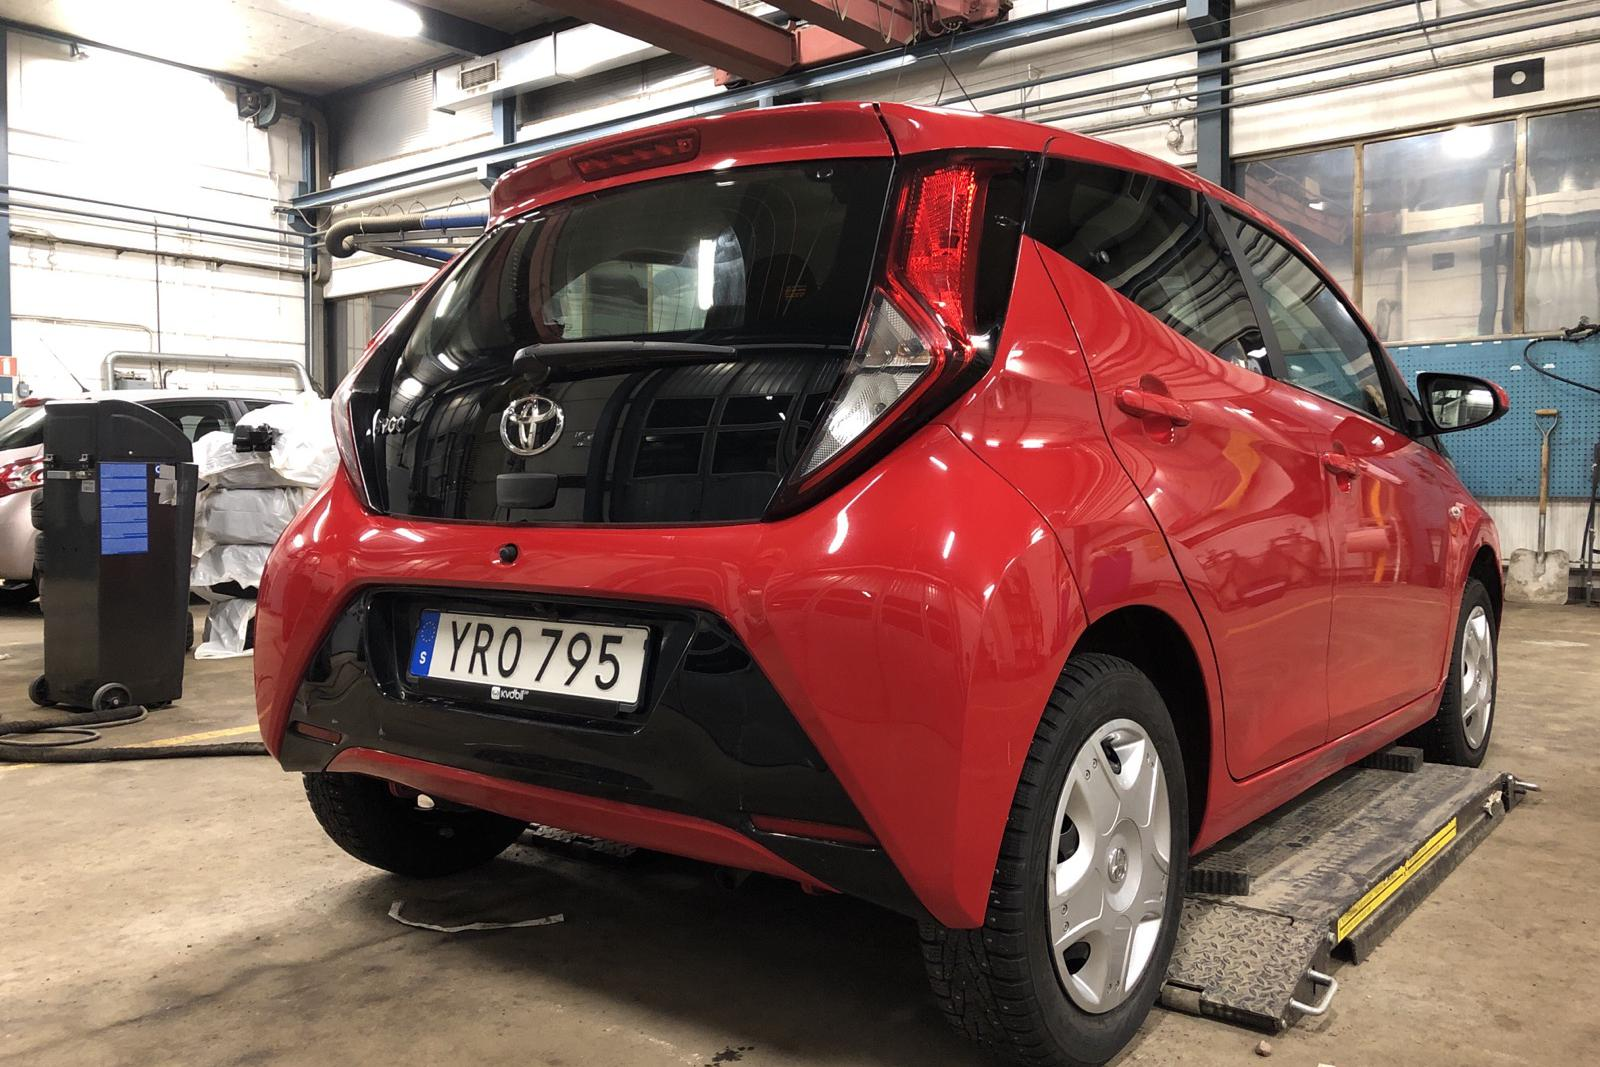 Toyota Aygo 1.0 5dr (72hk) - 6 441 mil - Manuell - röd - 2019